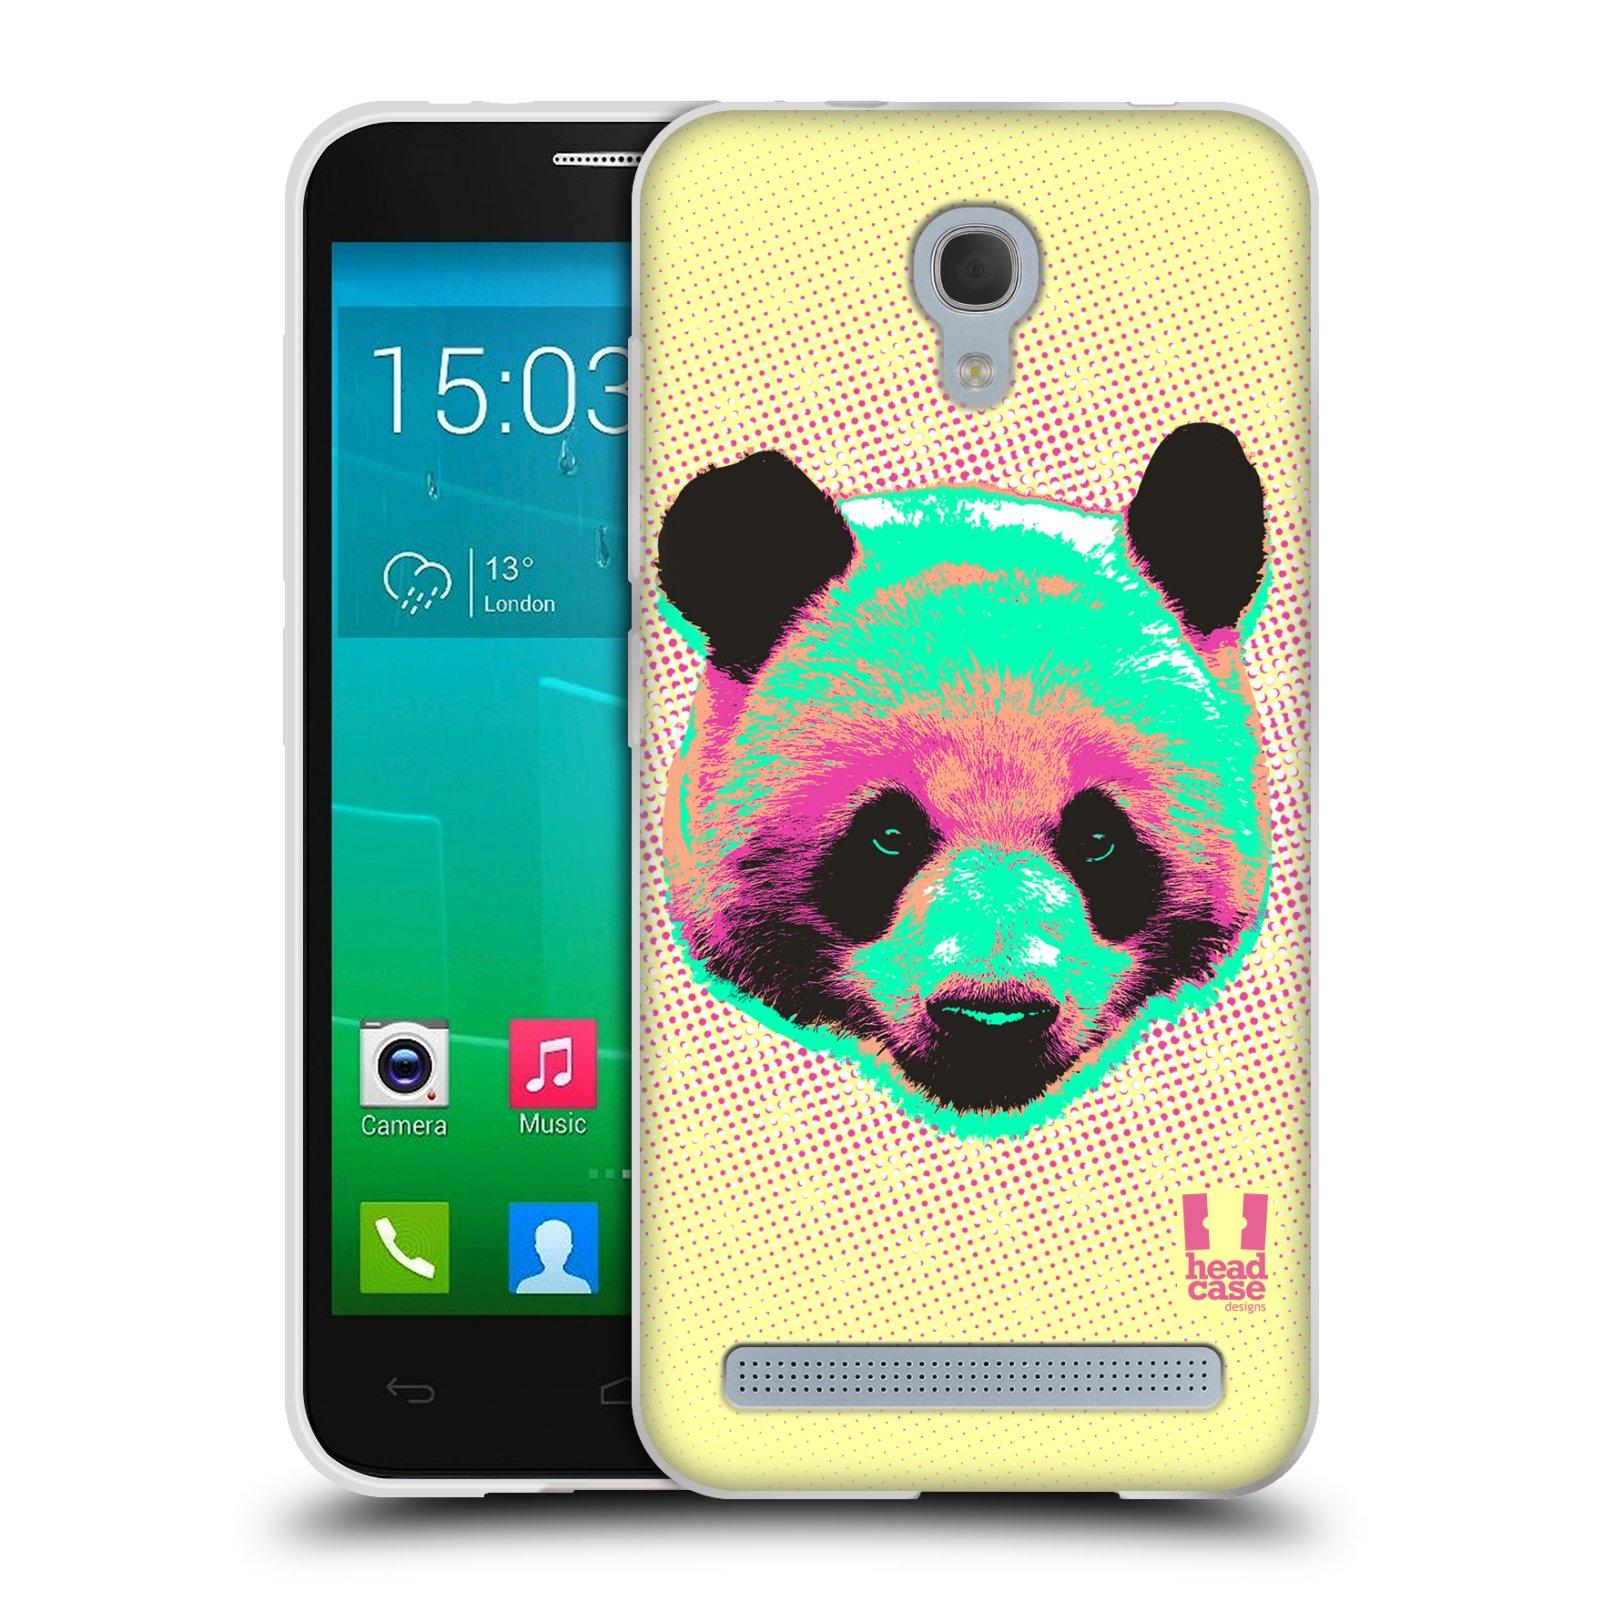 Silikonové pouzdro na mobil Alcatel One Touch Idol 2 Mini S 6036Y HEAD CASE POP PRINT PANDA (Silikonový kryt či obal na mobilní telefon Alcatel Idol 2 Mini S OT-6036Y)